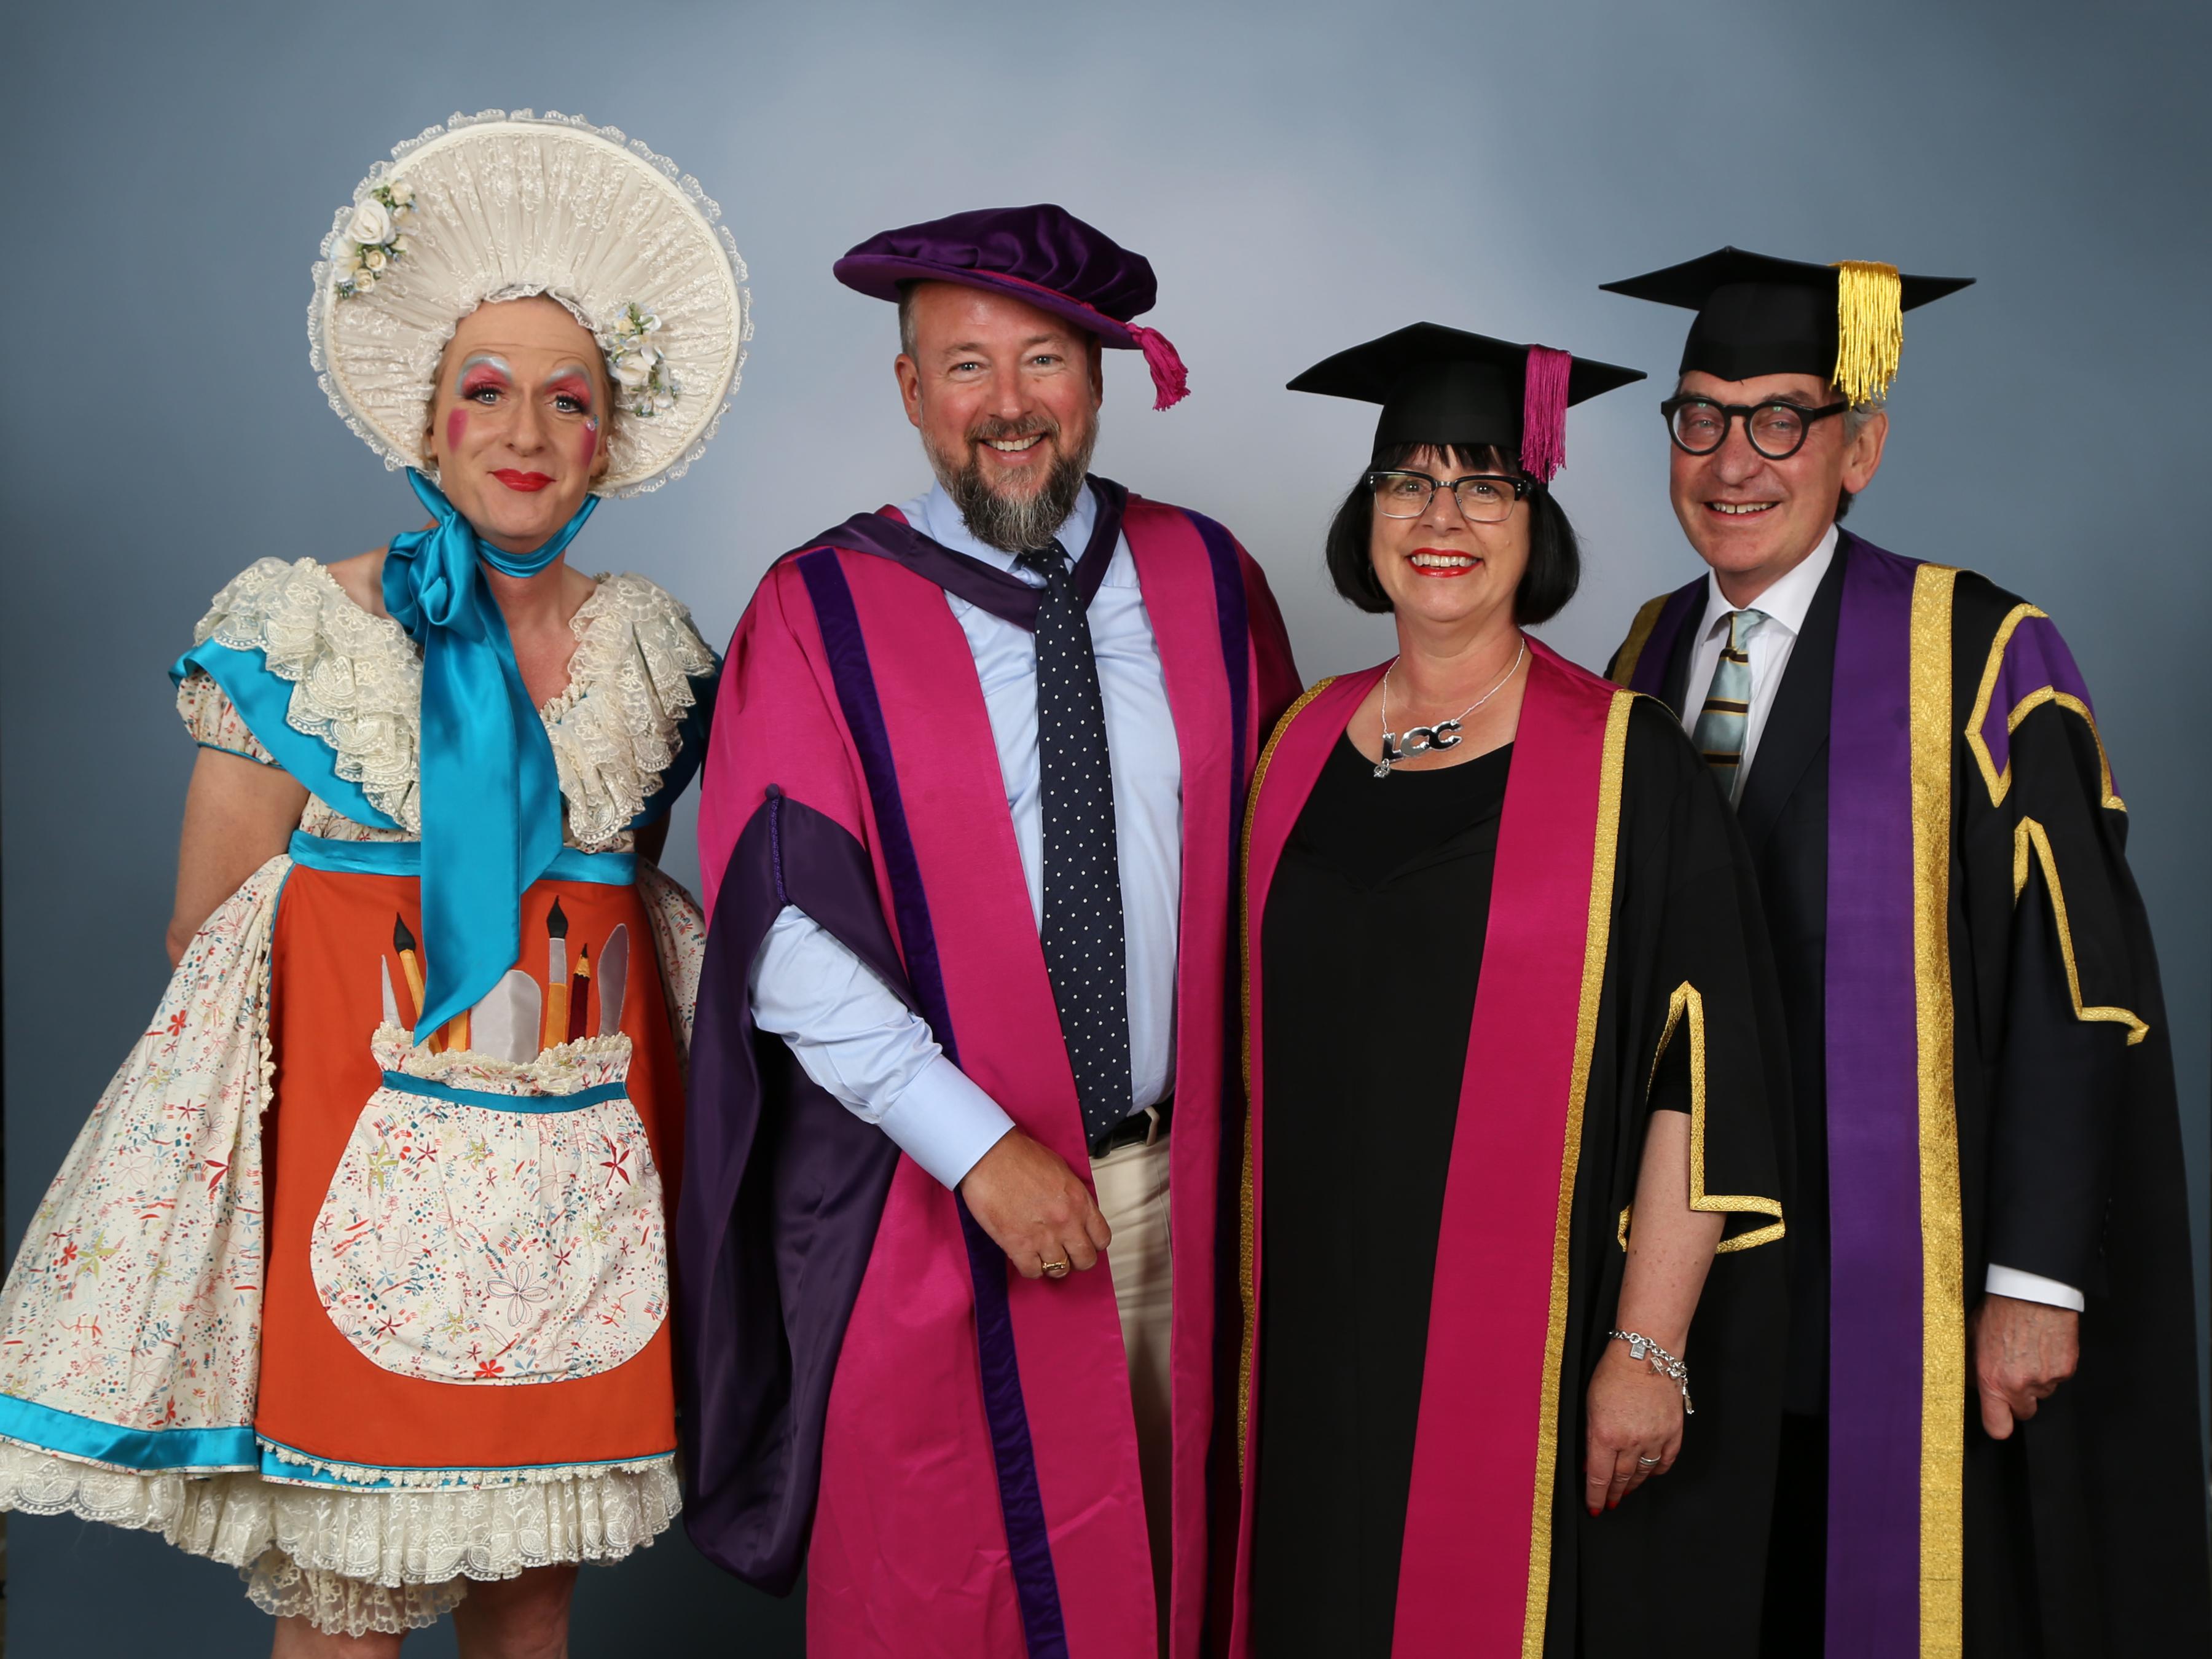 Shane Smith, Honorary Graduate